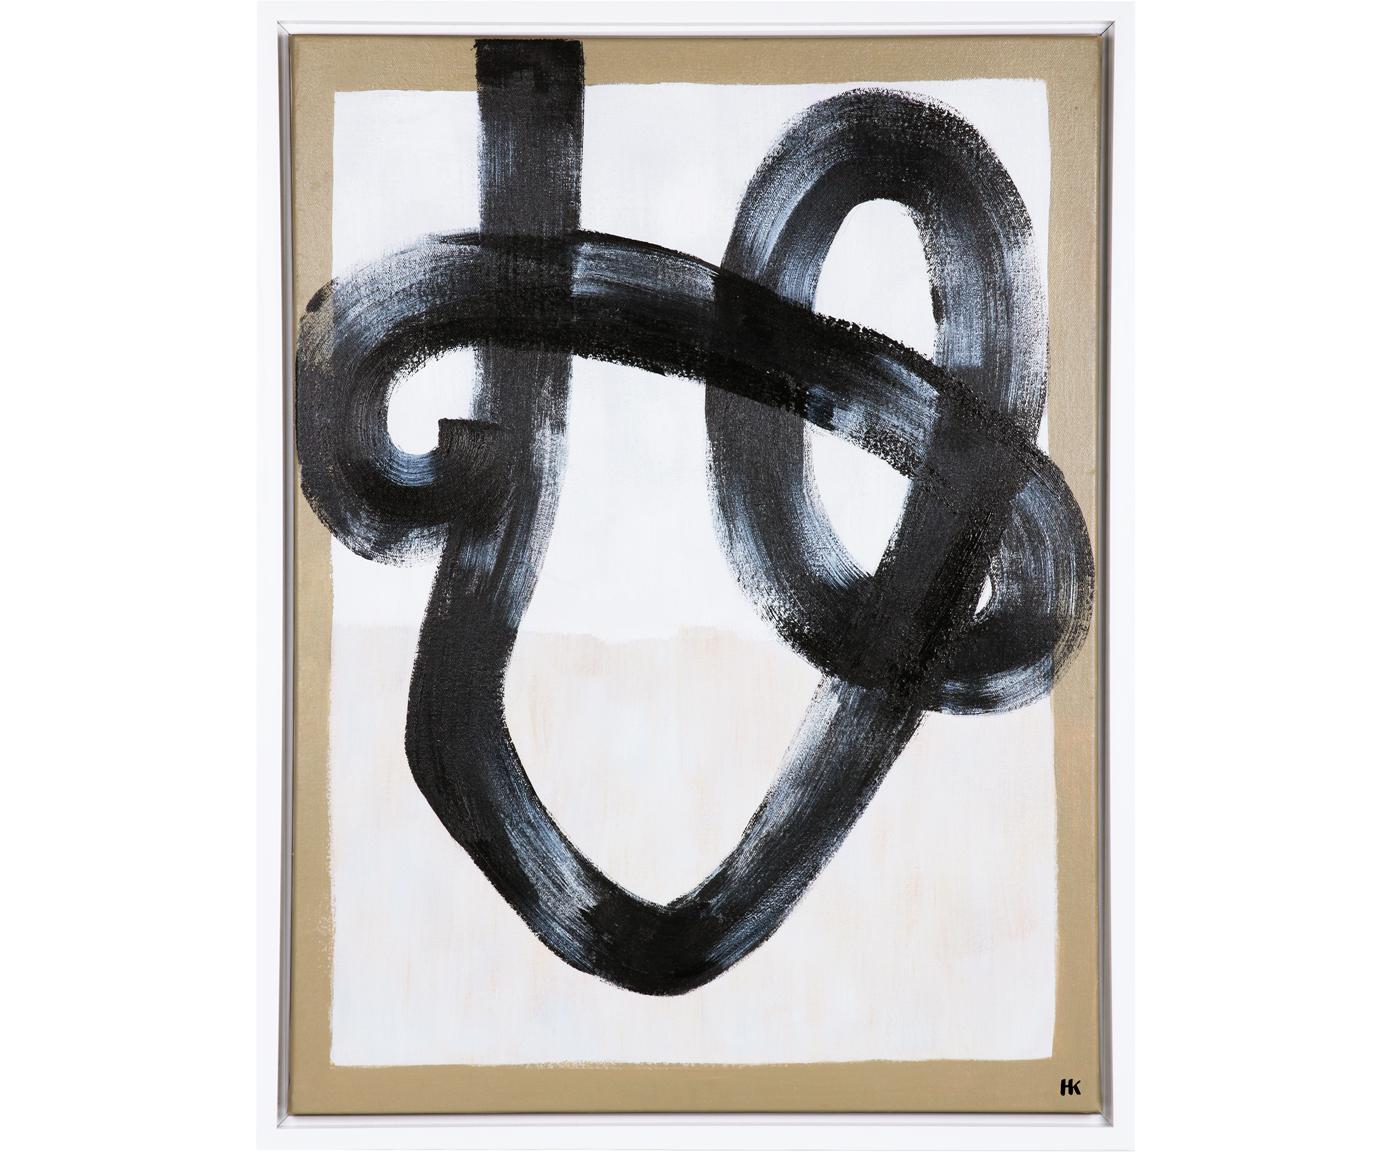 Ingelijste canvasdoek Brush, Hout, textiel, polyurethaan, acryl, Zwart, wit, 60 x 80 cm